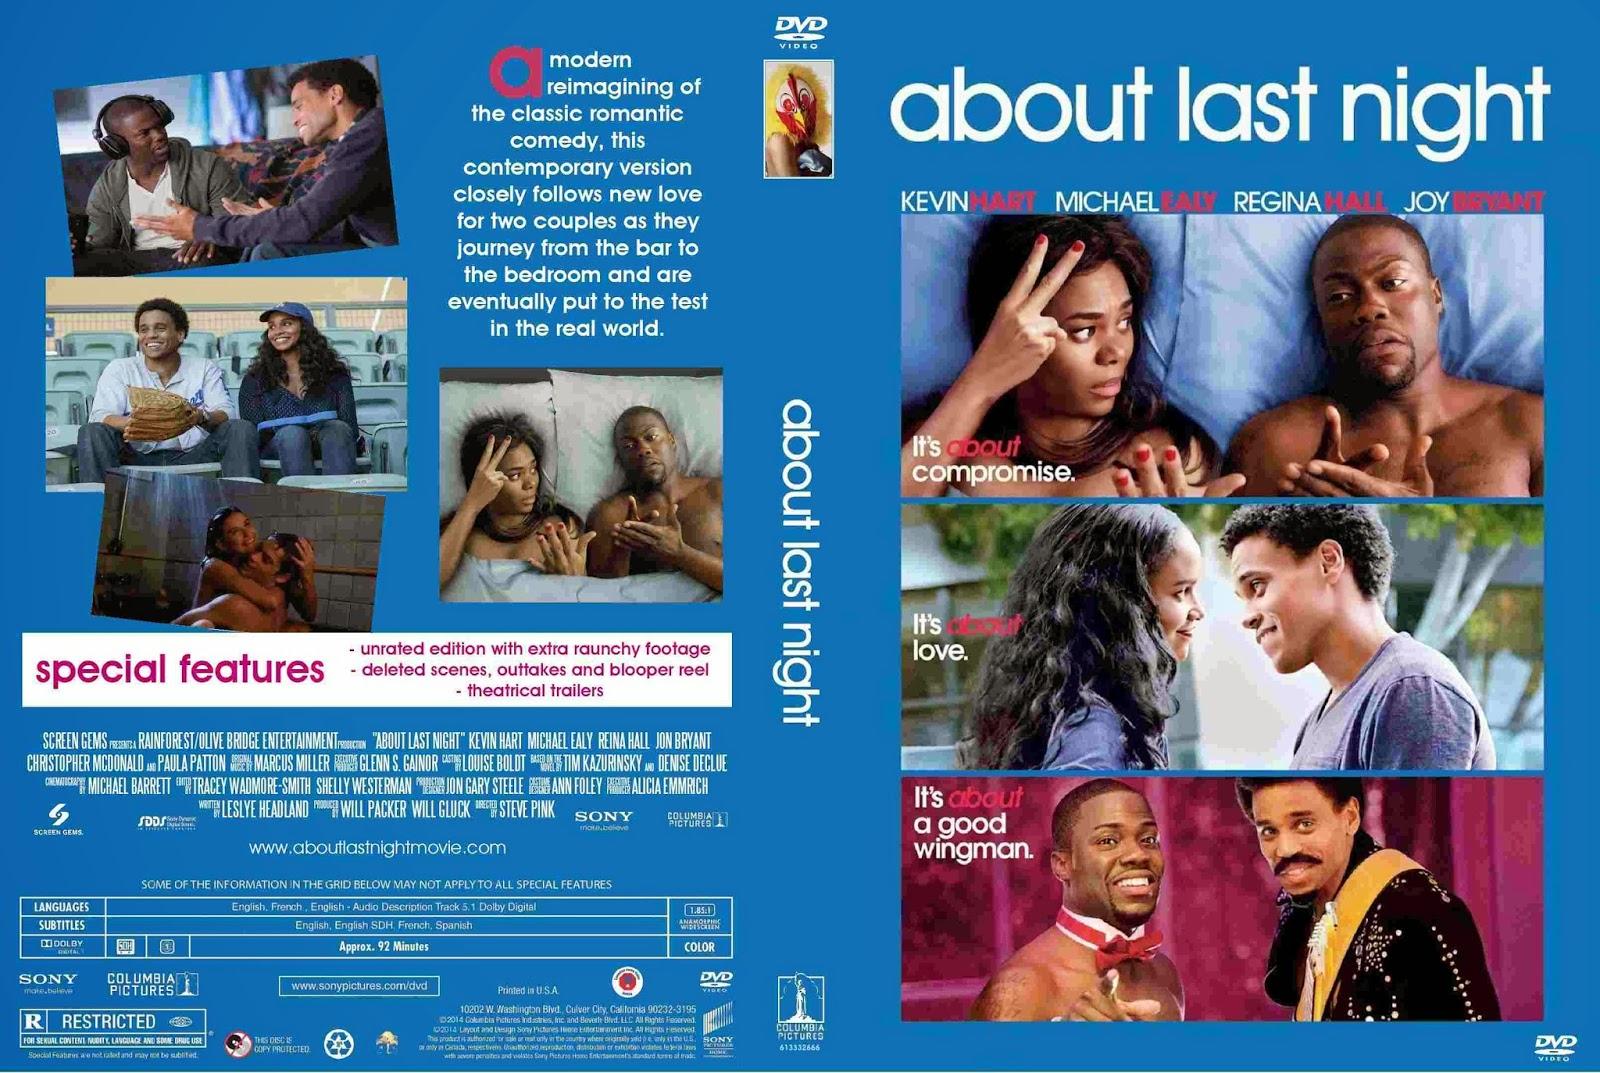 Download Sobre Ontem à Noite BDRip XviD Dual Áudio About Last Night  2014    Cover DVD Movie